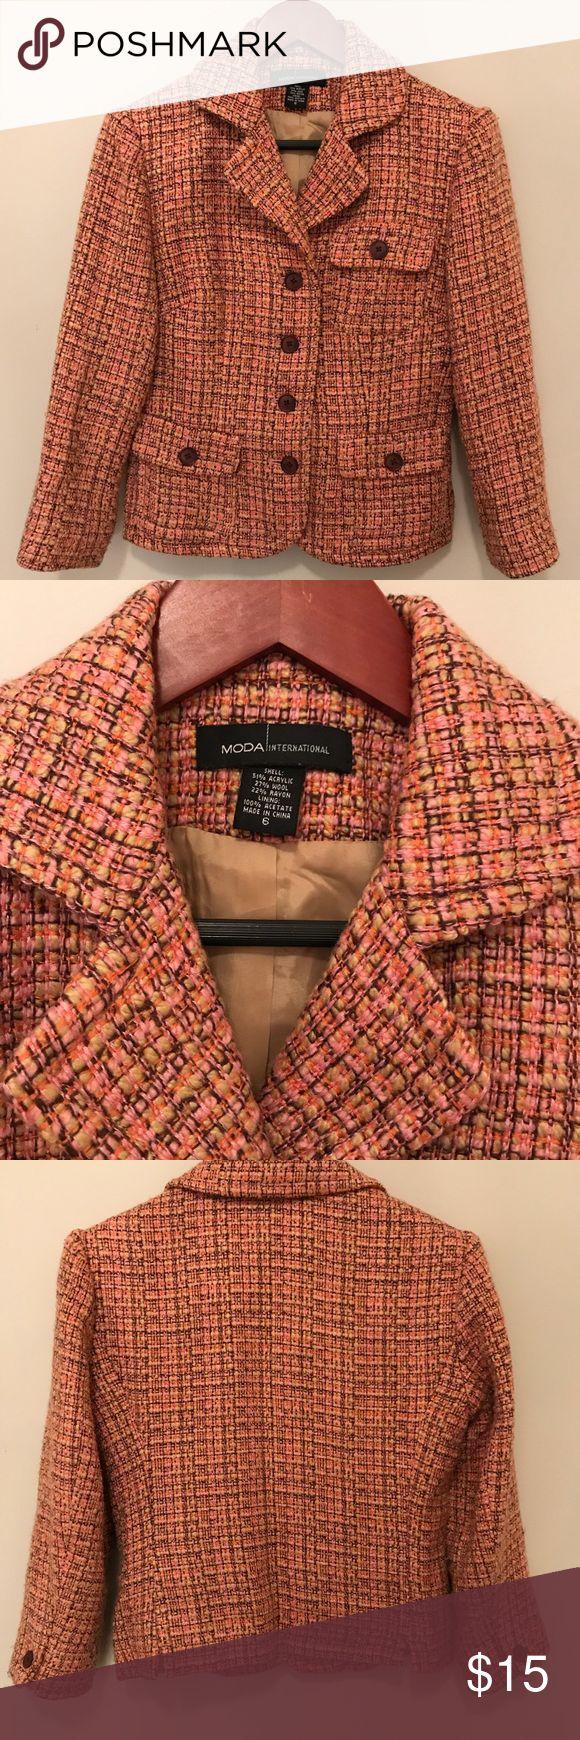 Moda international Tweed Blazer Tweed plaid blazer by Moda International (Victoria's Secret catalog order) Excellent condition  Wool blend Lined Size 6 Moda International Jackets & Coats Blazers